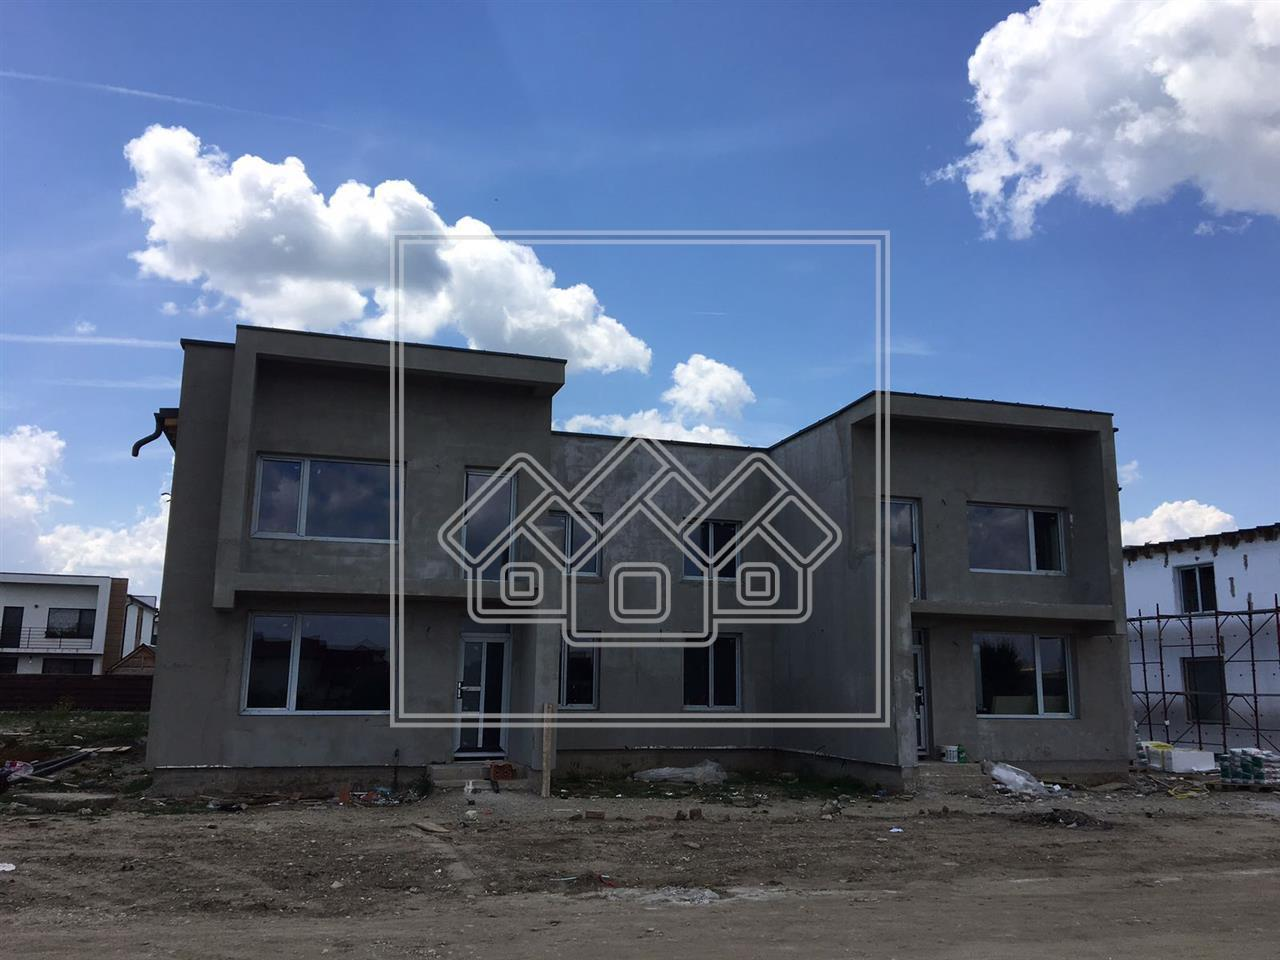 Casa de vanzare in Sibiu + gradina spatioasa 310mp frumos amenajata